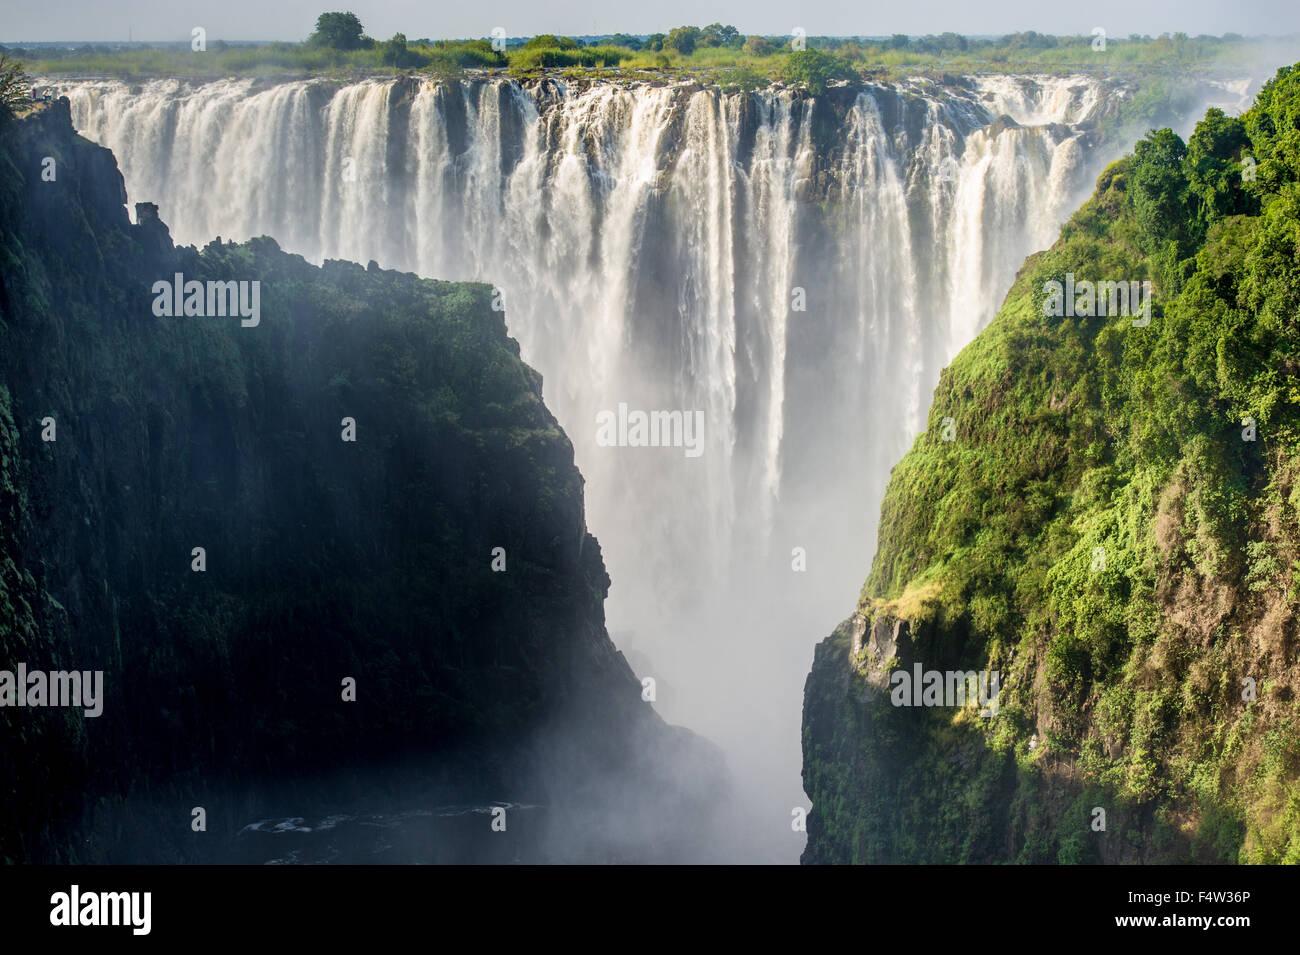 LIVINGSTONE, Zambia, África - Las Cataratas Victoria (Mosi-oa-Tunya) , mundos más grande cascada , sobre Imagen De Stock